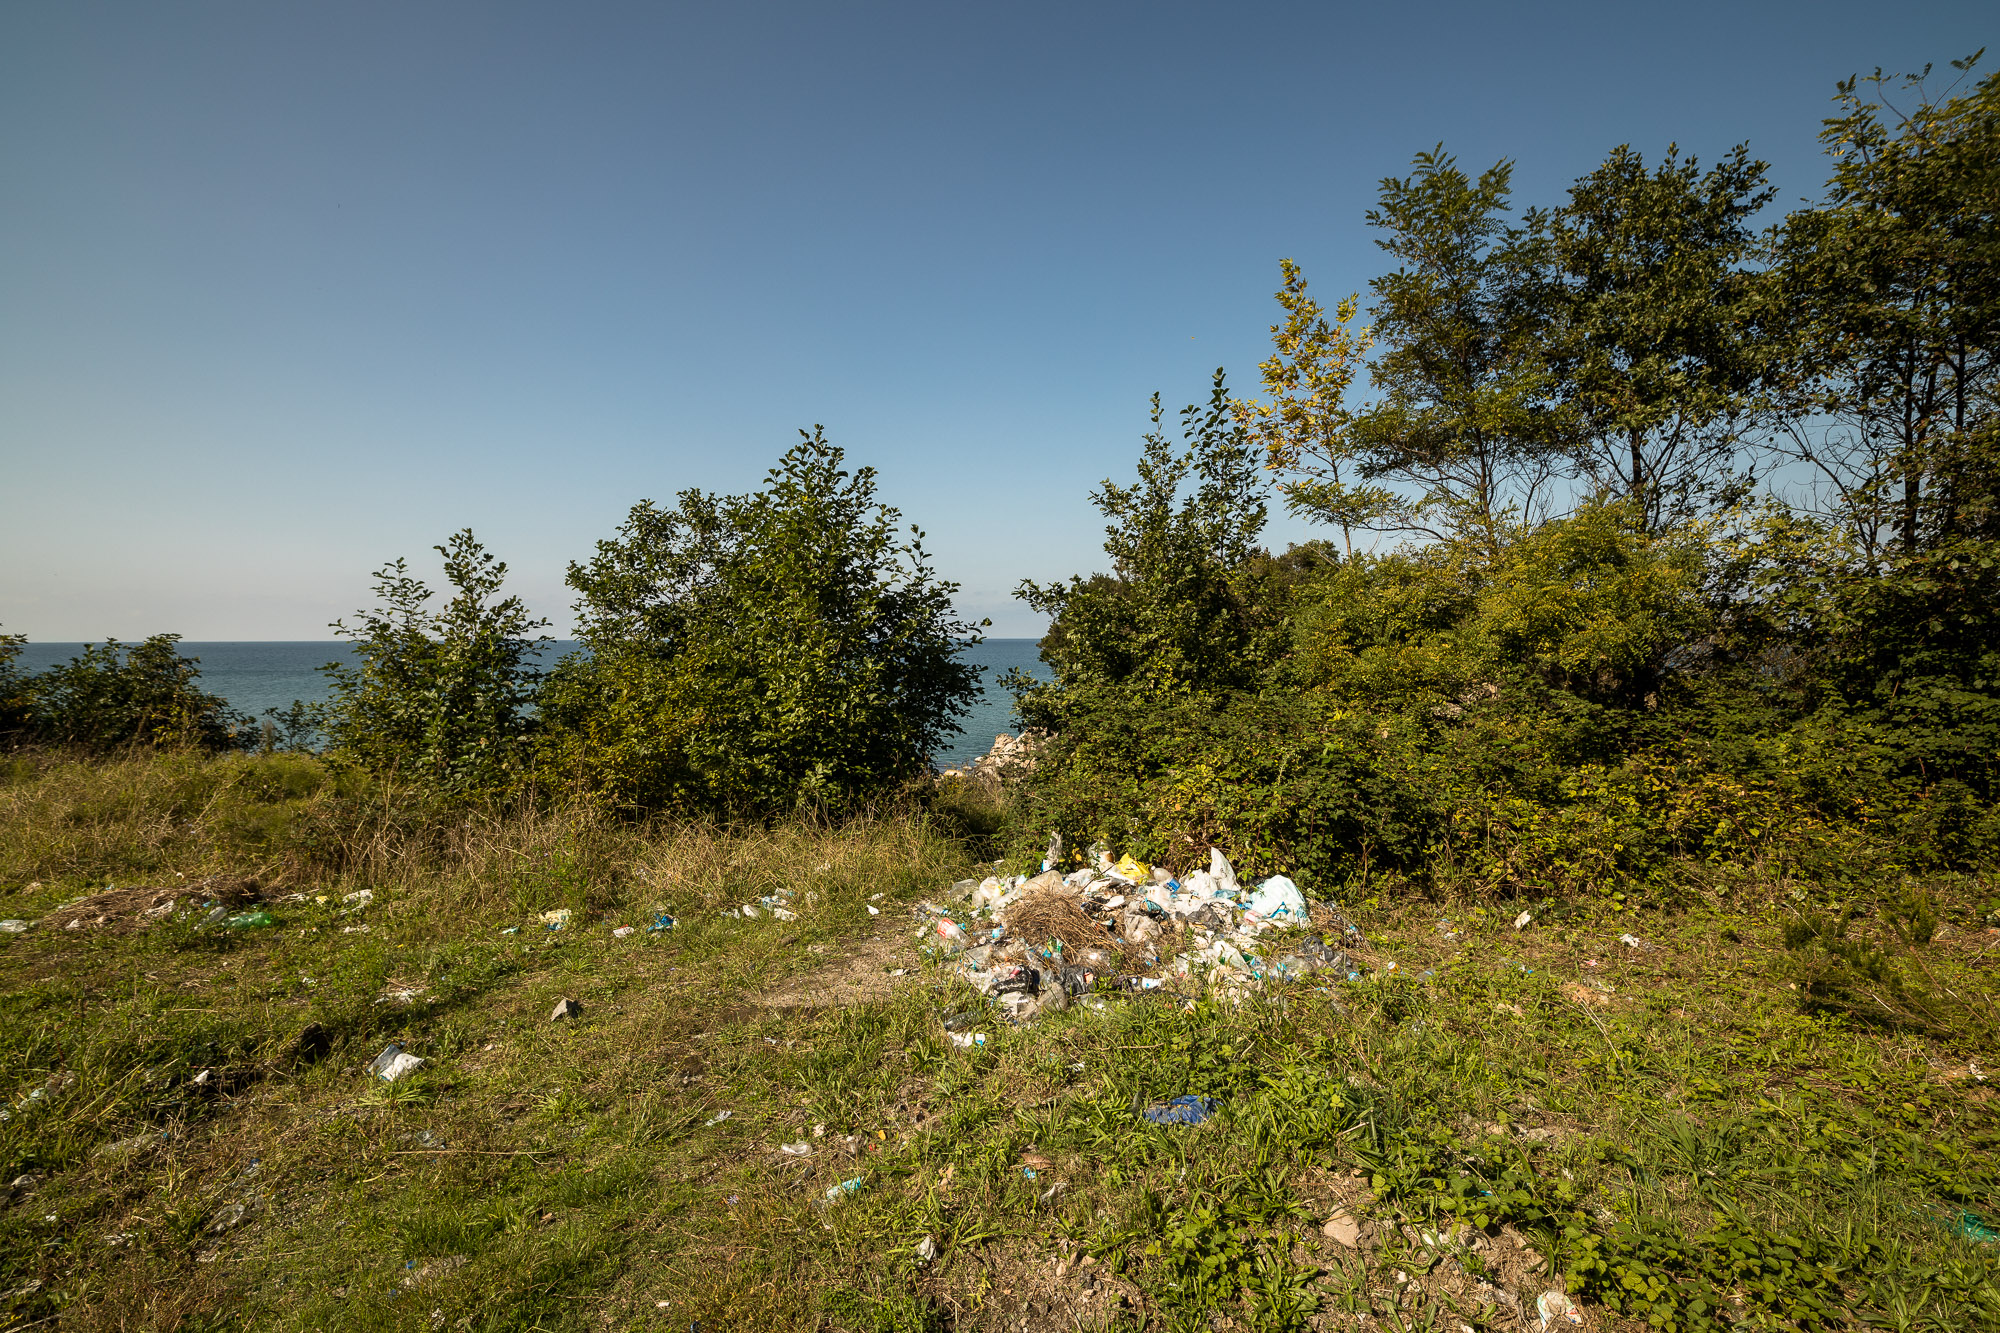 seaside trash